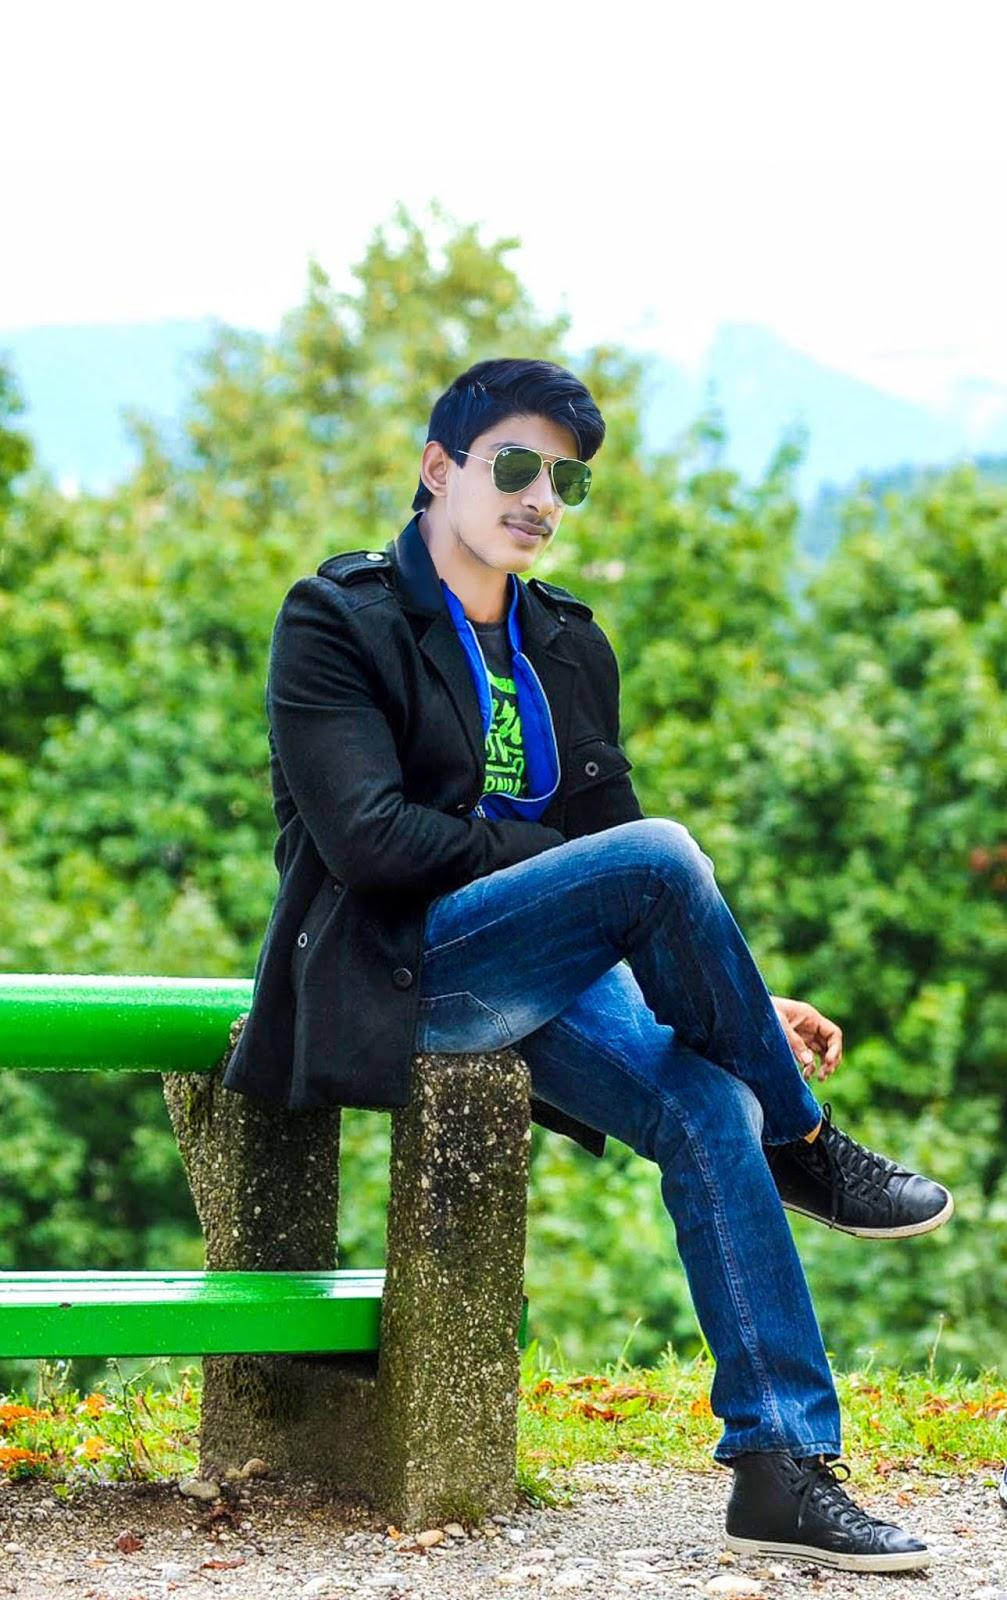 Ram charan bruce lee hd images download